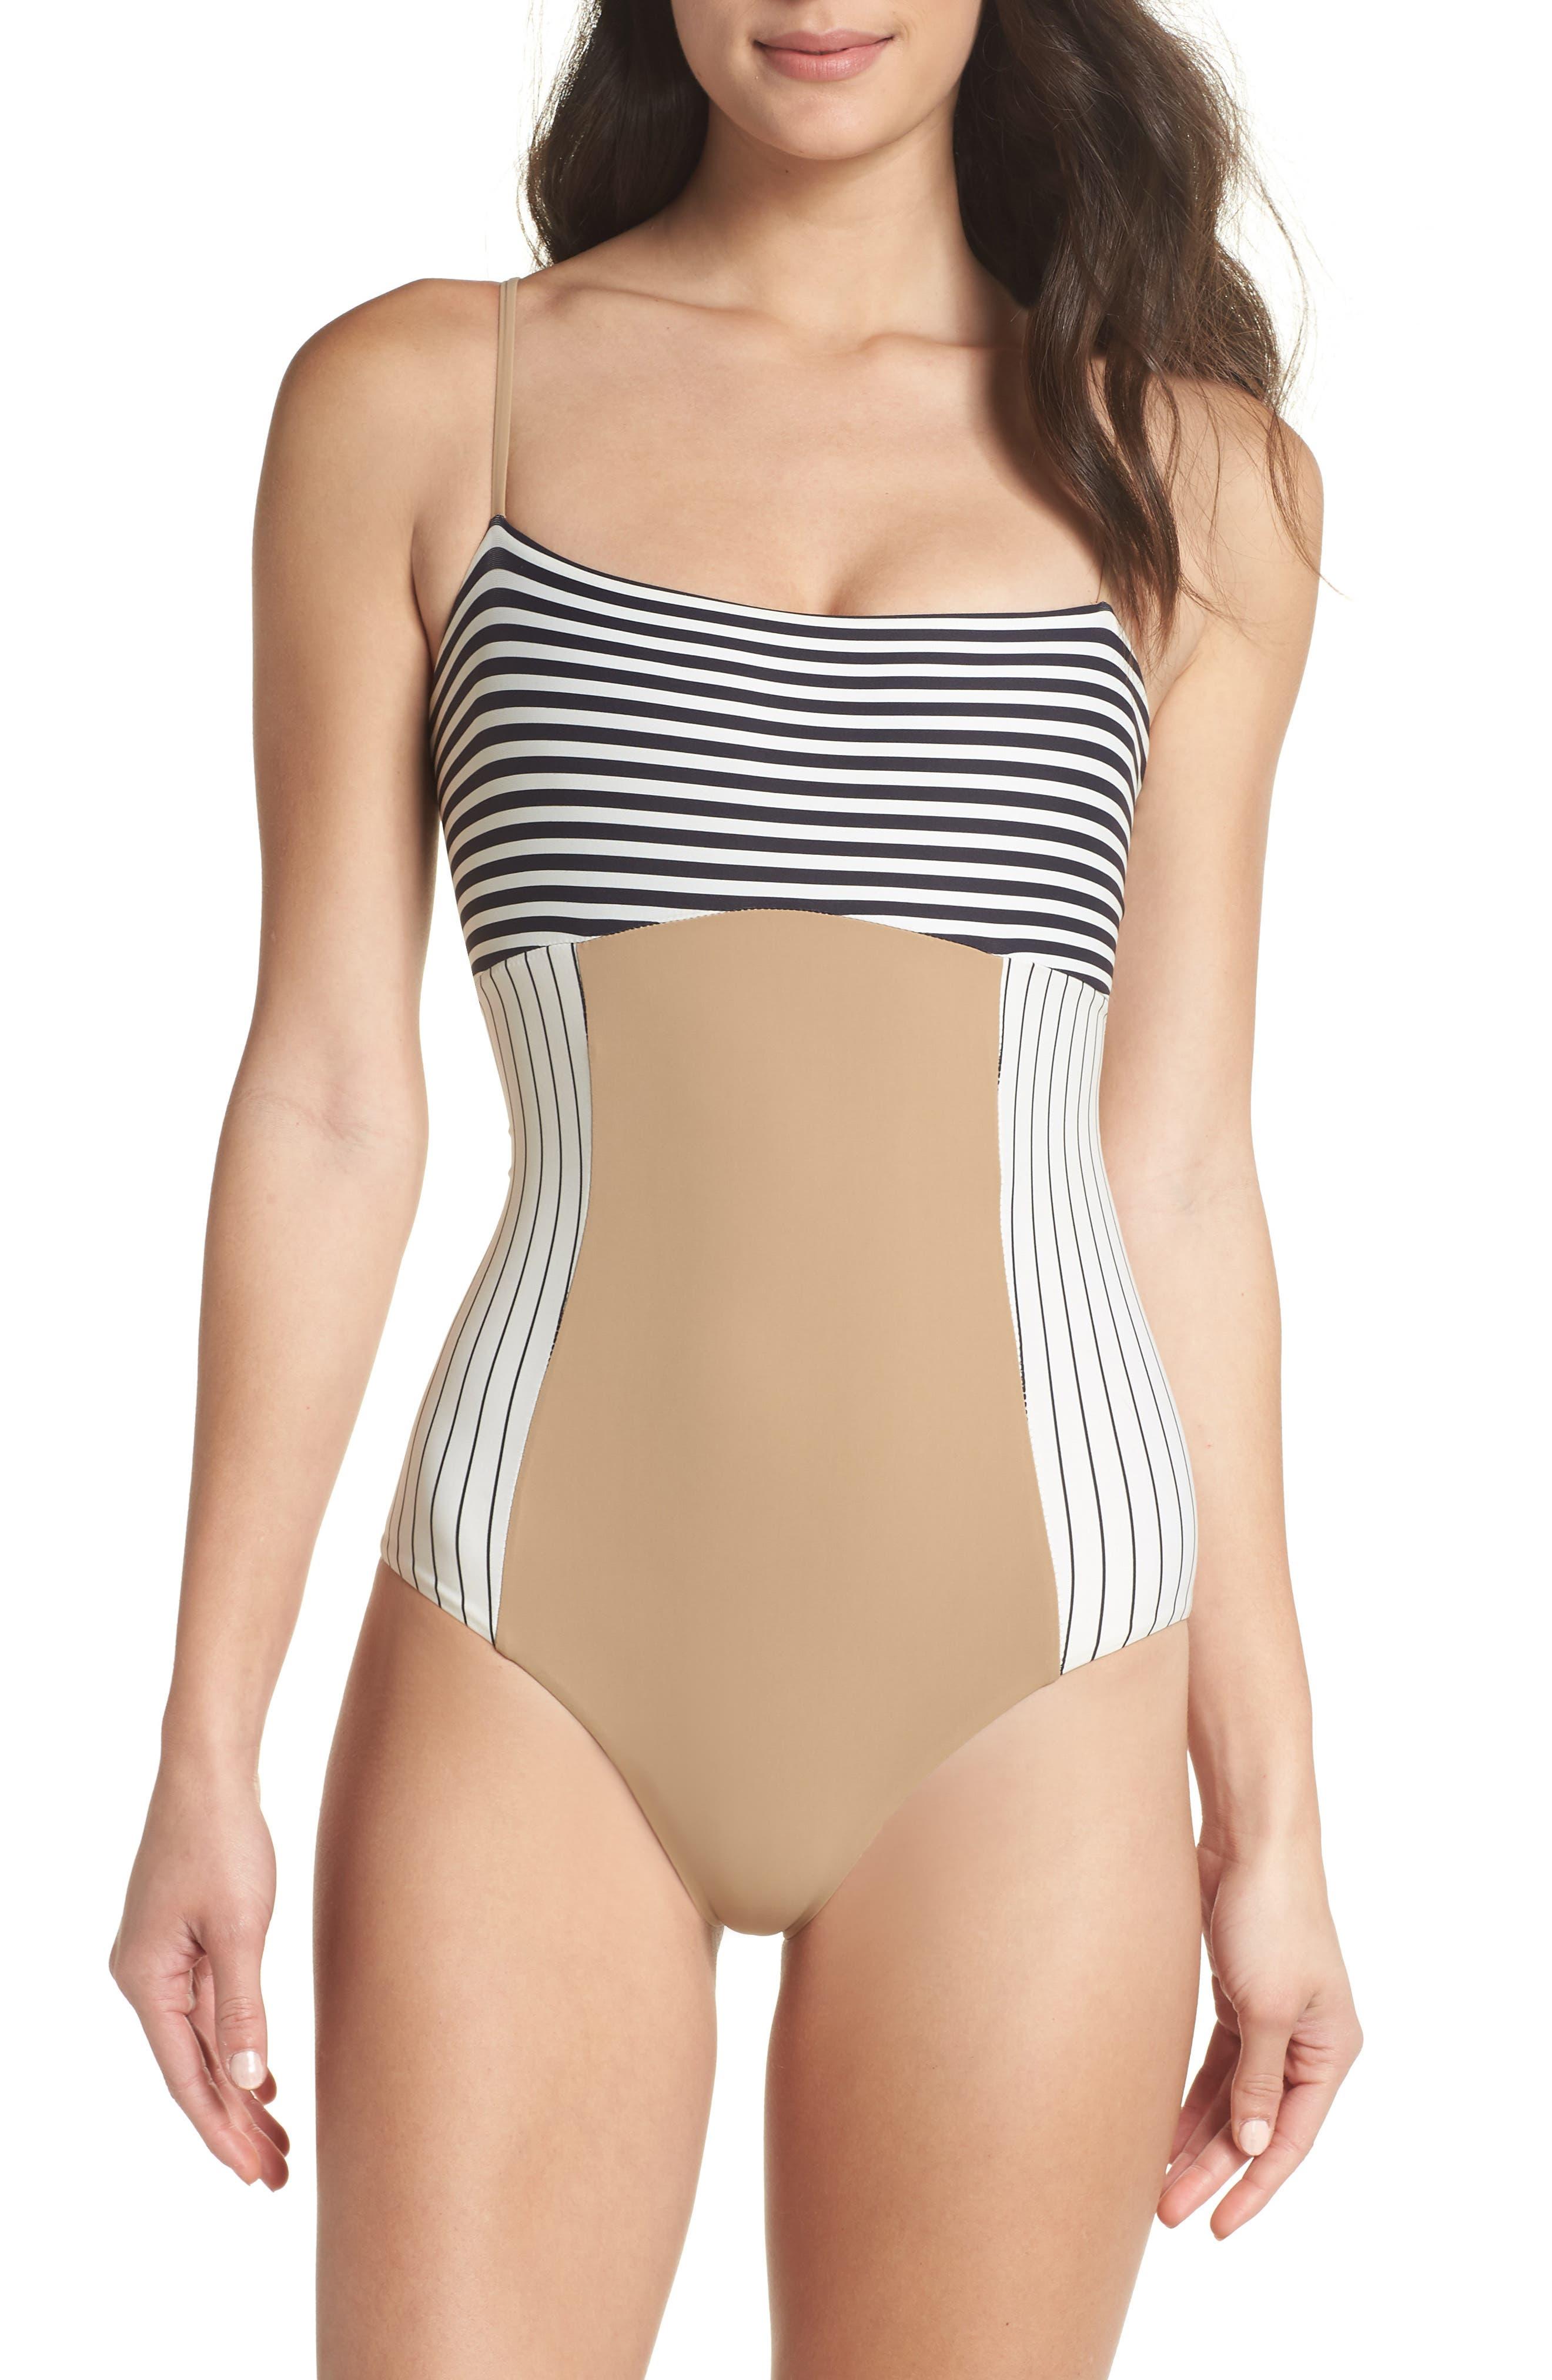 Finn One-Piece Swimsuit,                             Main thumbnail 1, color,